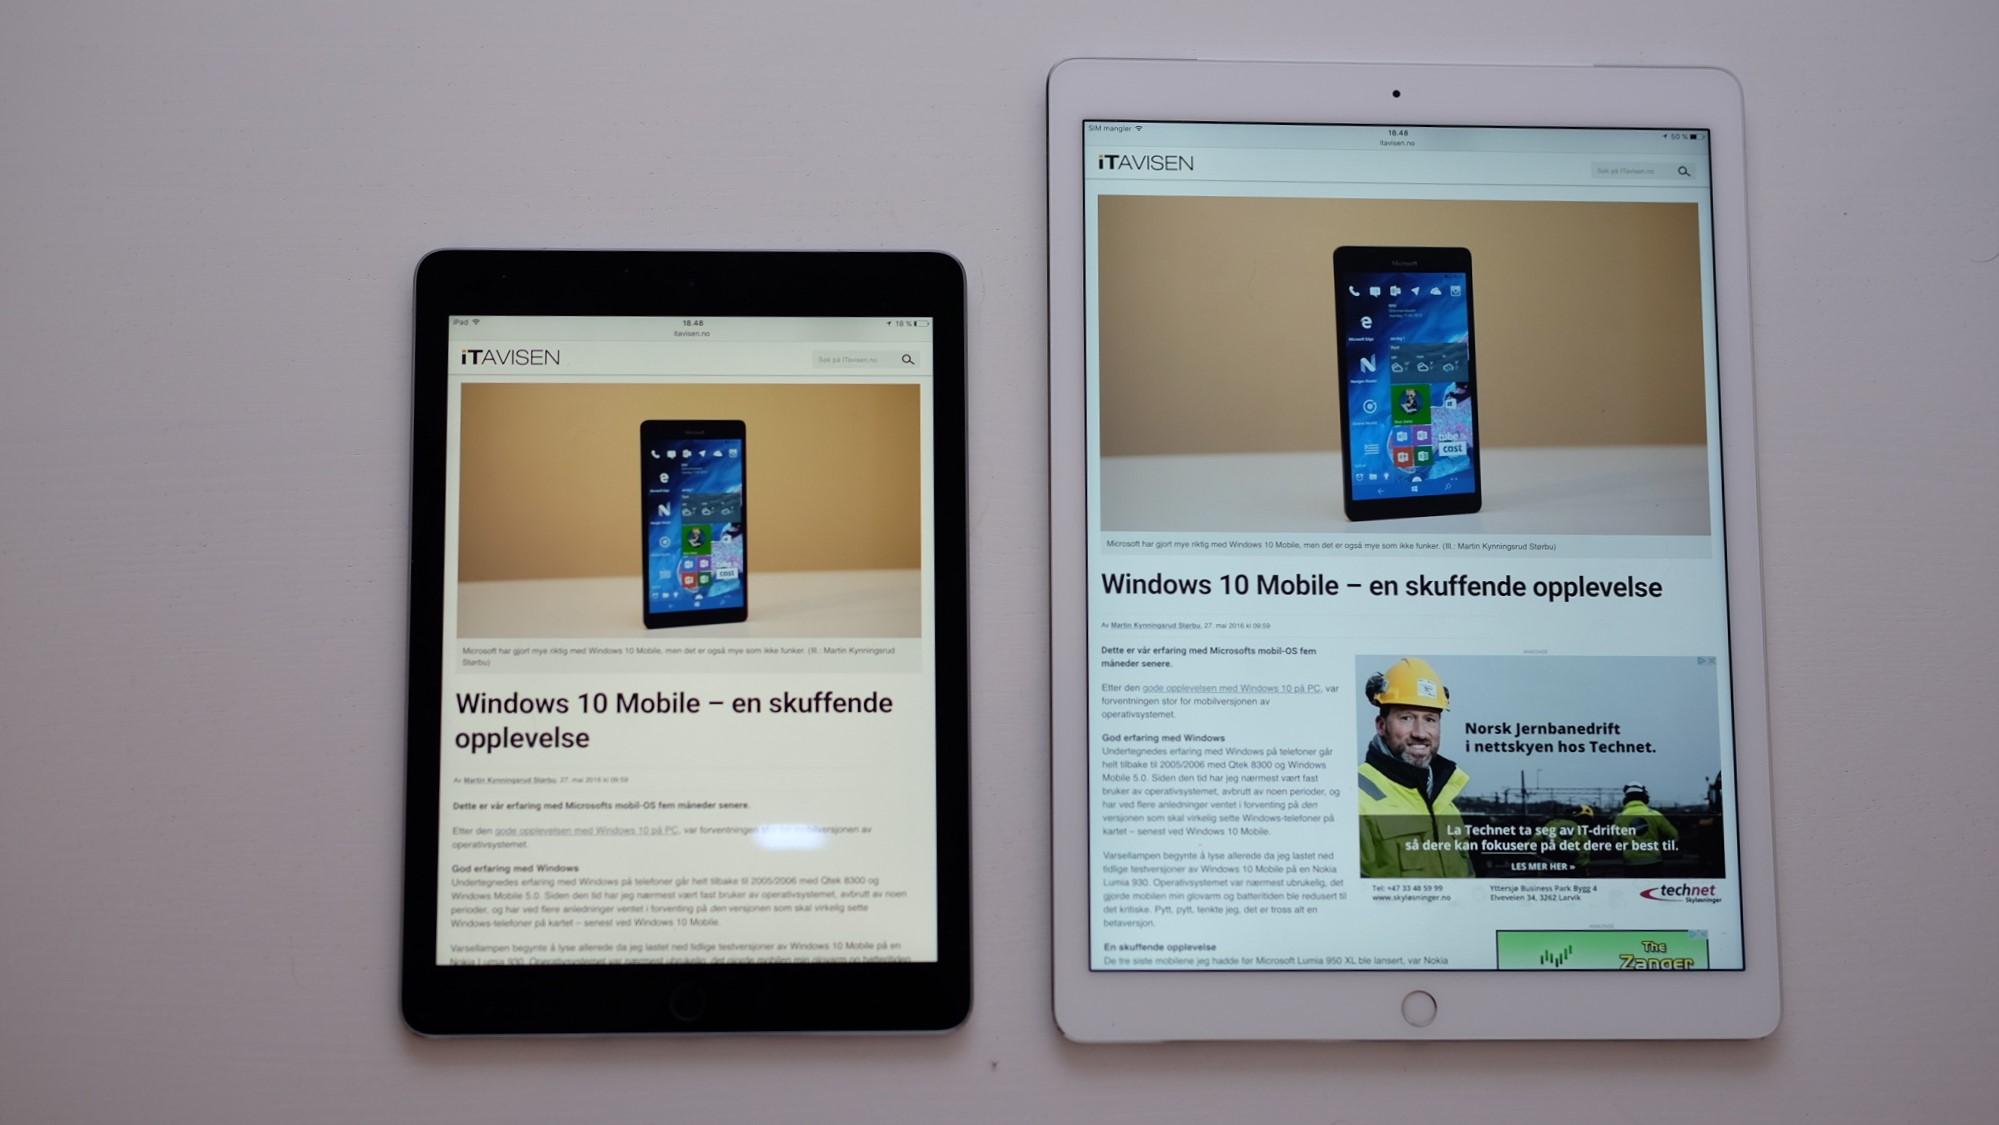 Til venstre: iPad Pro 9,7 med True Tone. Høyre: iPad Pro 12,9 uten True Tone.